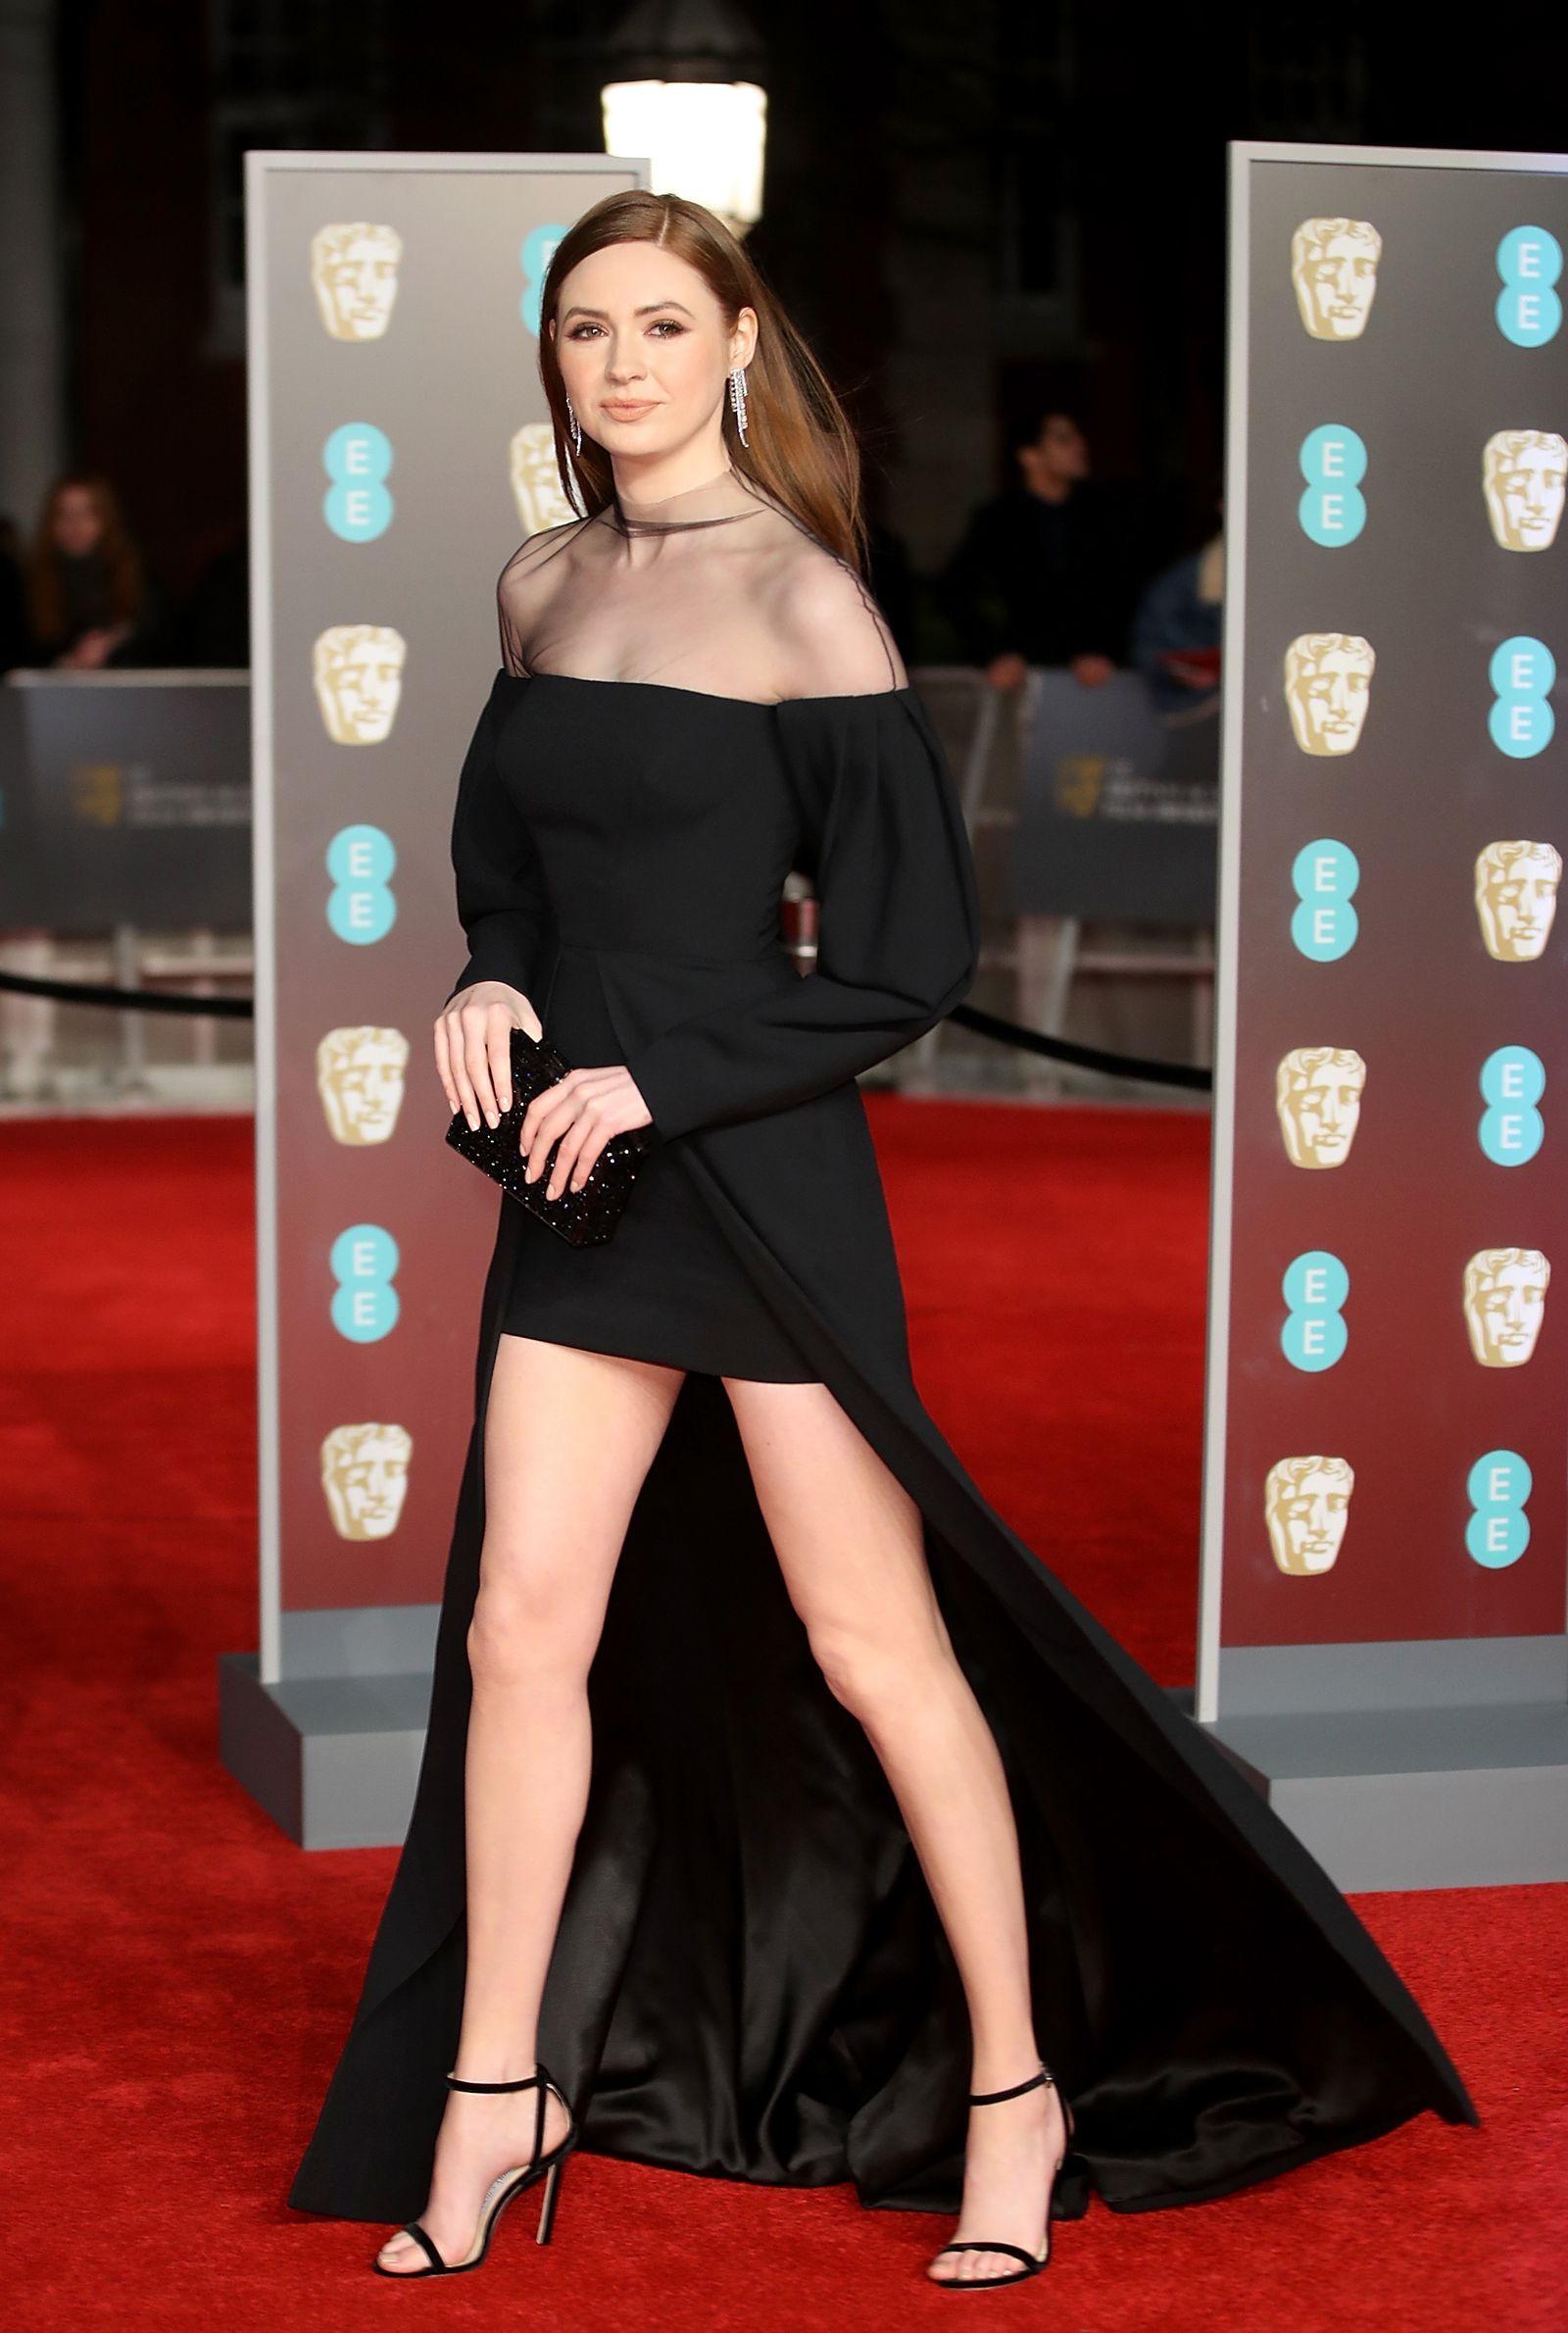 Baftas 2020 All The Red Carpet Looks Black Dress Red Carpet Celebrity Black Dress Karen Gillan [ 2380 x 1600 Pixel ]